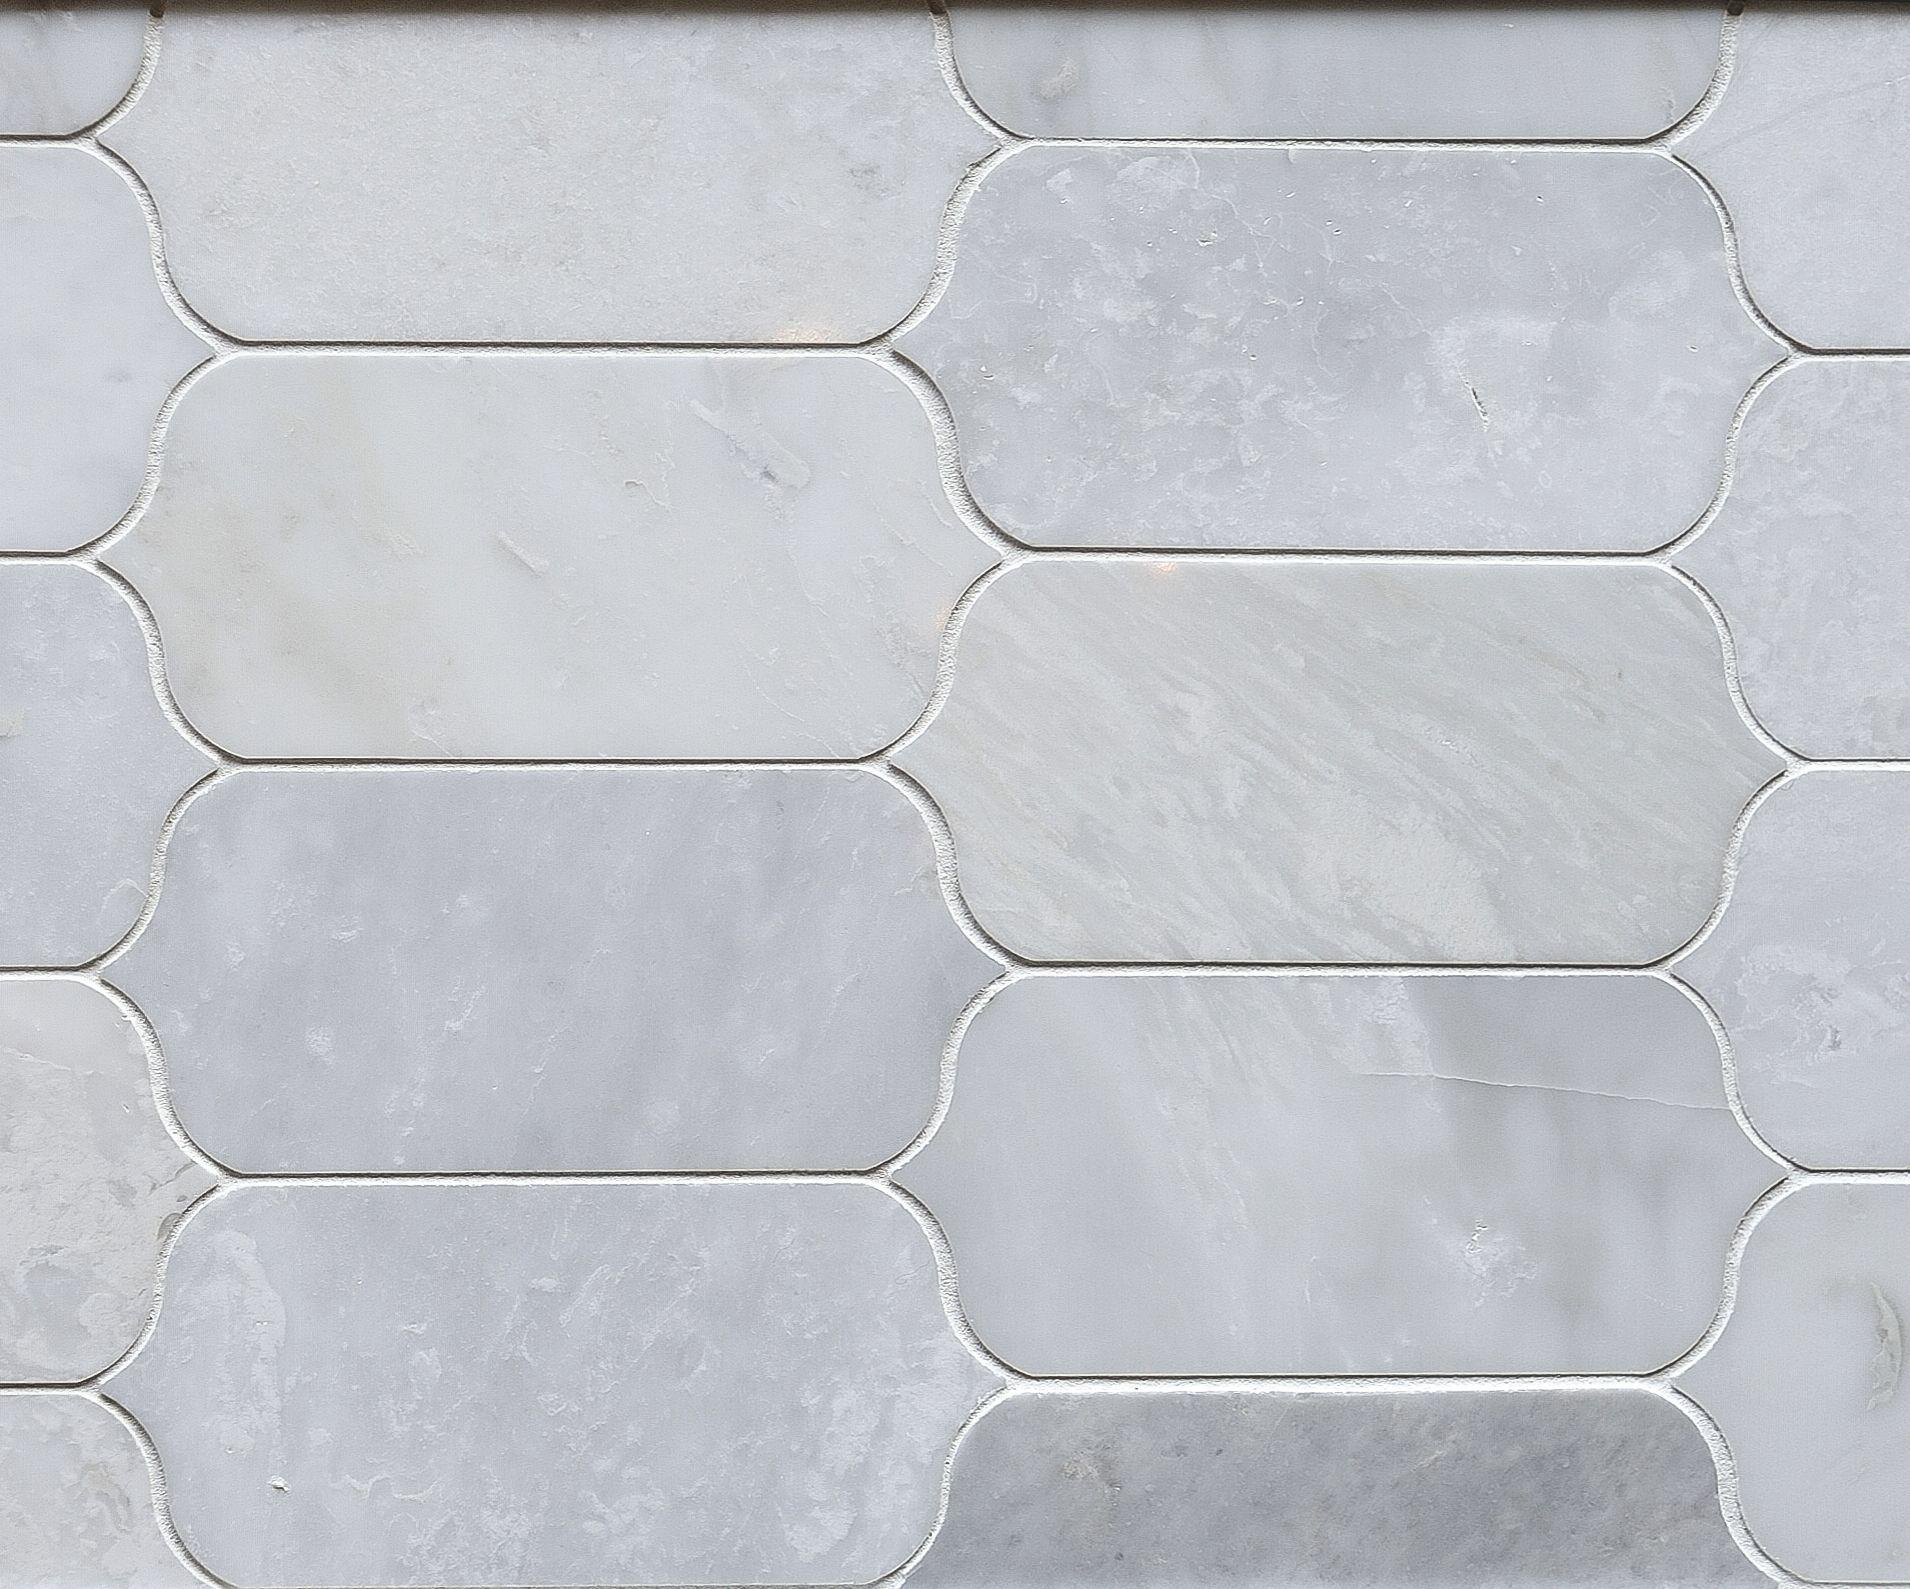 Marble Mo48 Stormy Mist Ingot Mosaic Level 6 As Backsplash Kitchen Tiles Backsplash Kitchen Redo Daltile